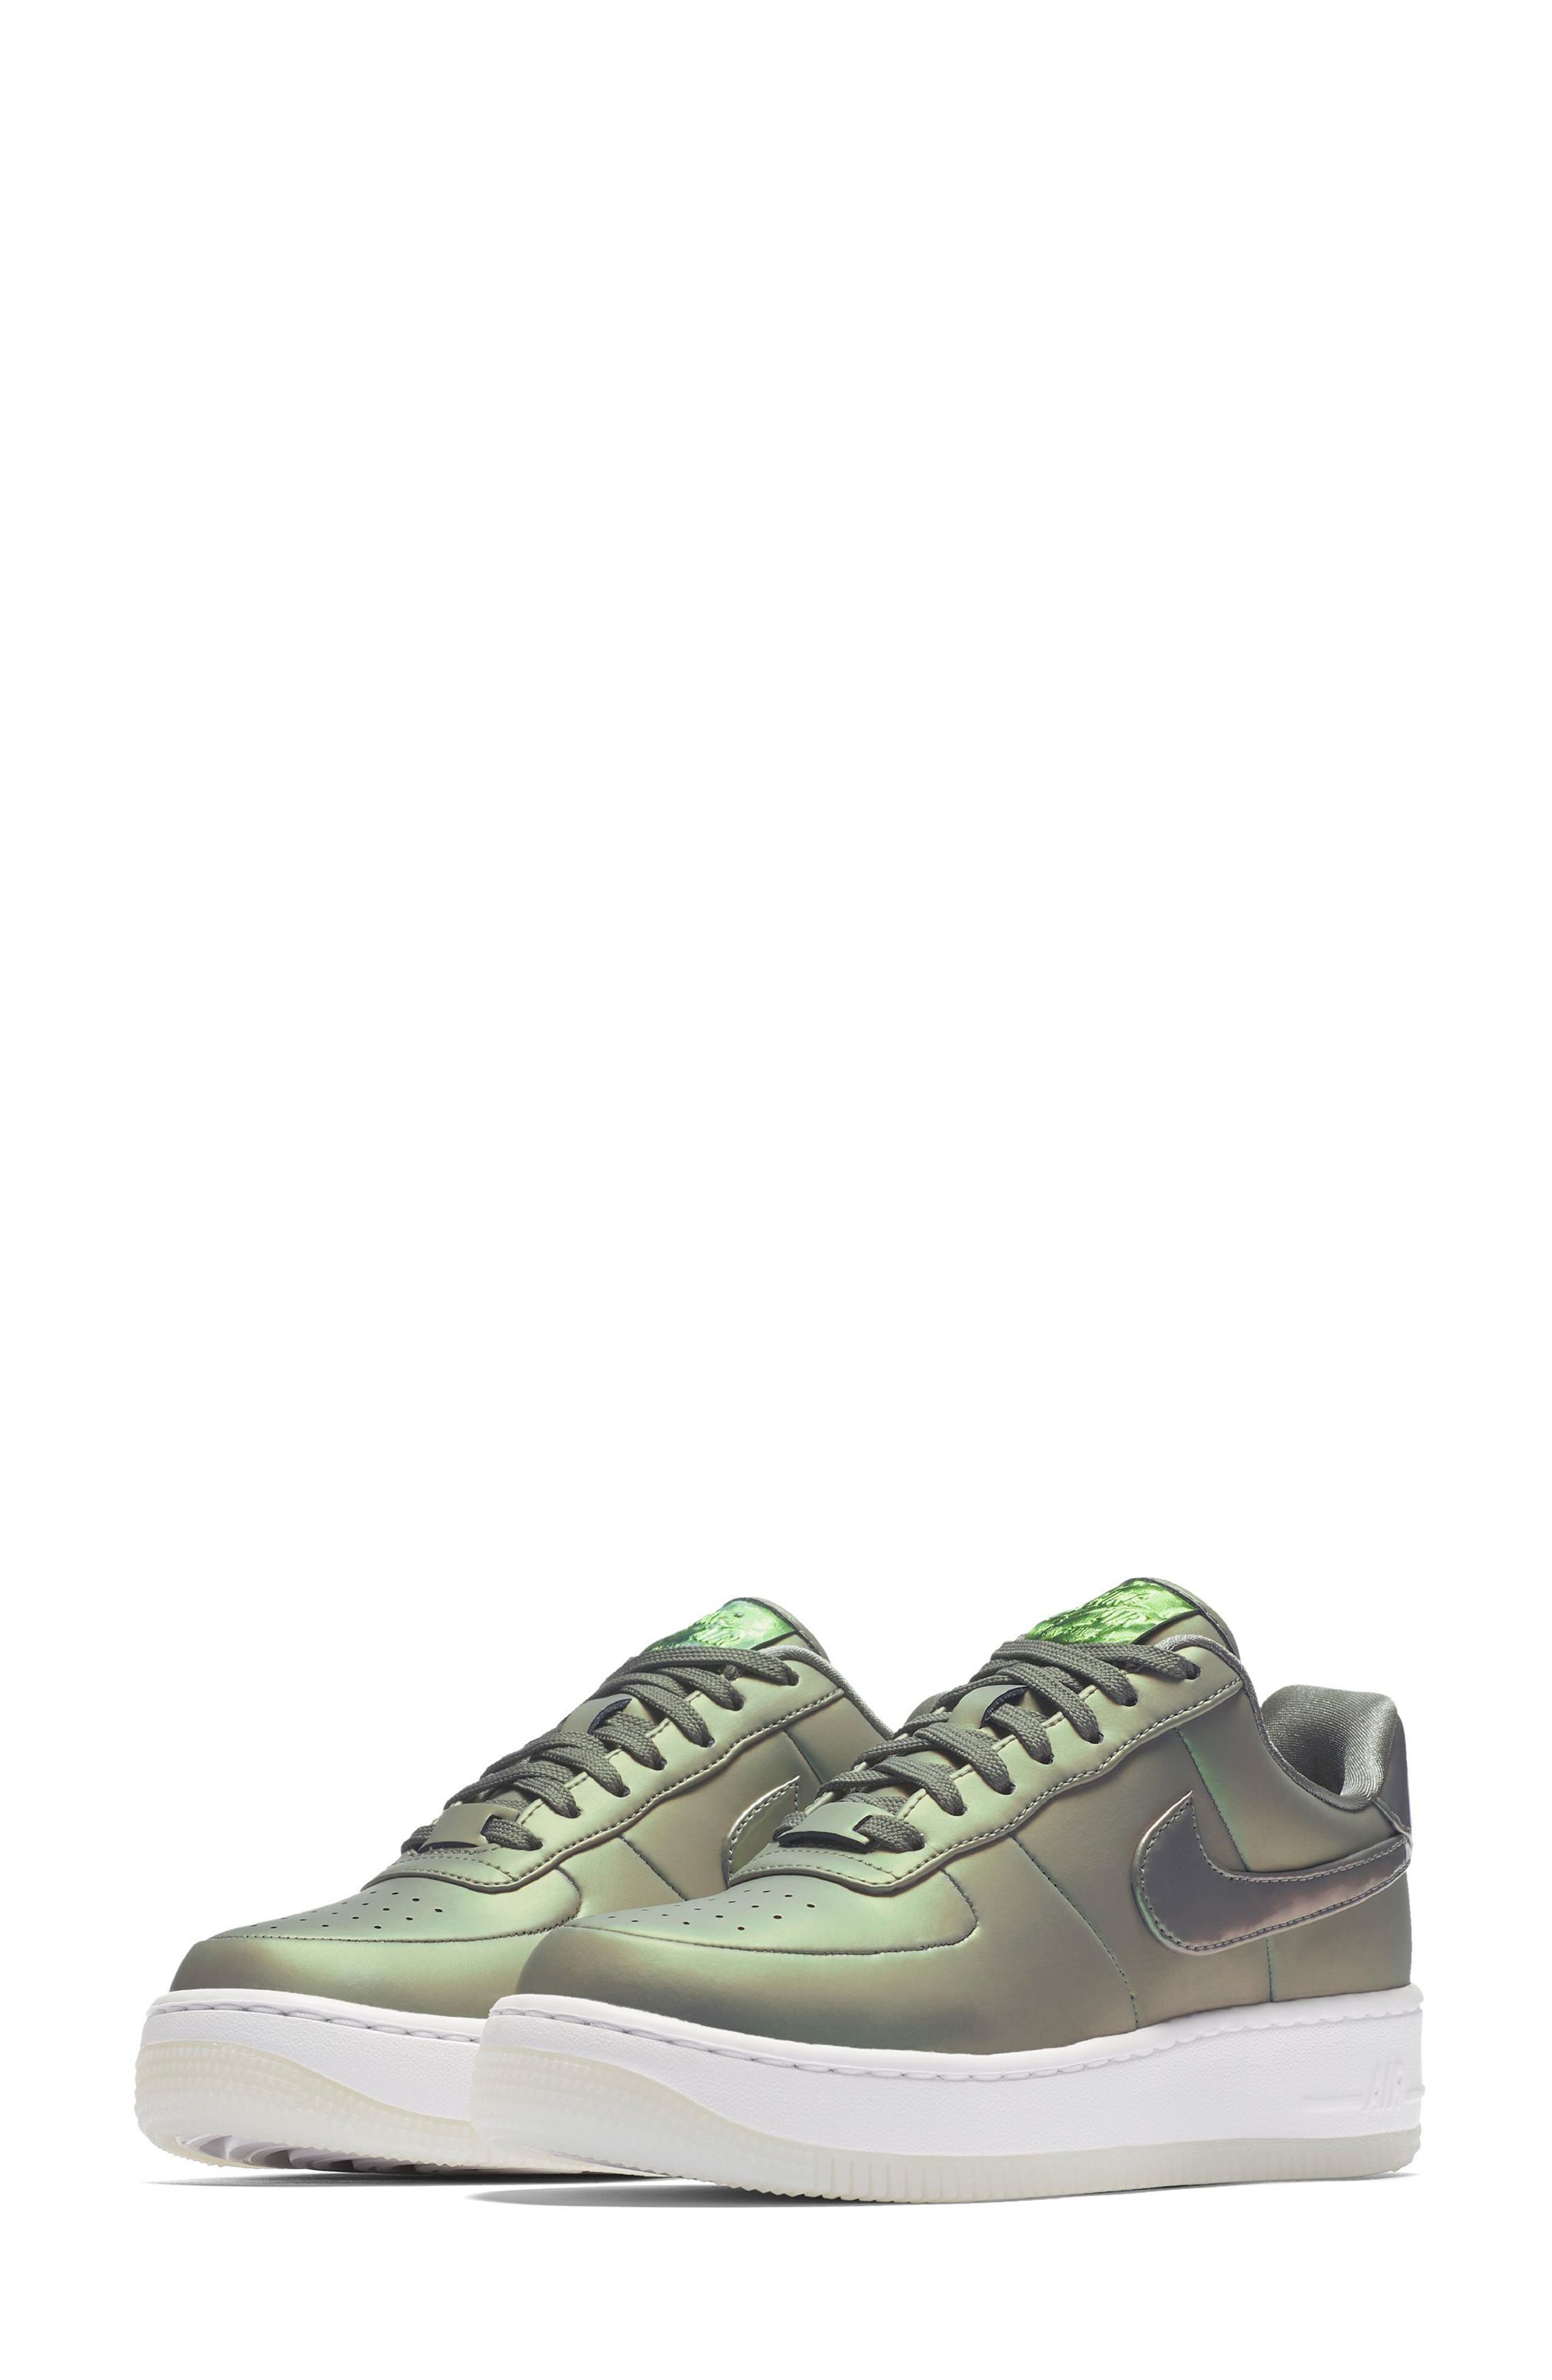 Air Force 1 Upstep Premium LX Shoe,                             Main thumbnail 1, color,                             252